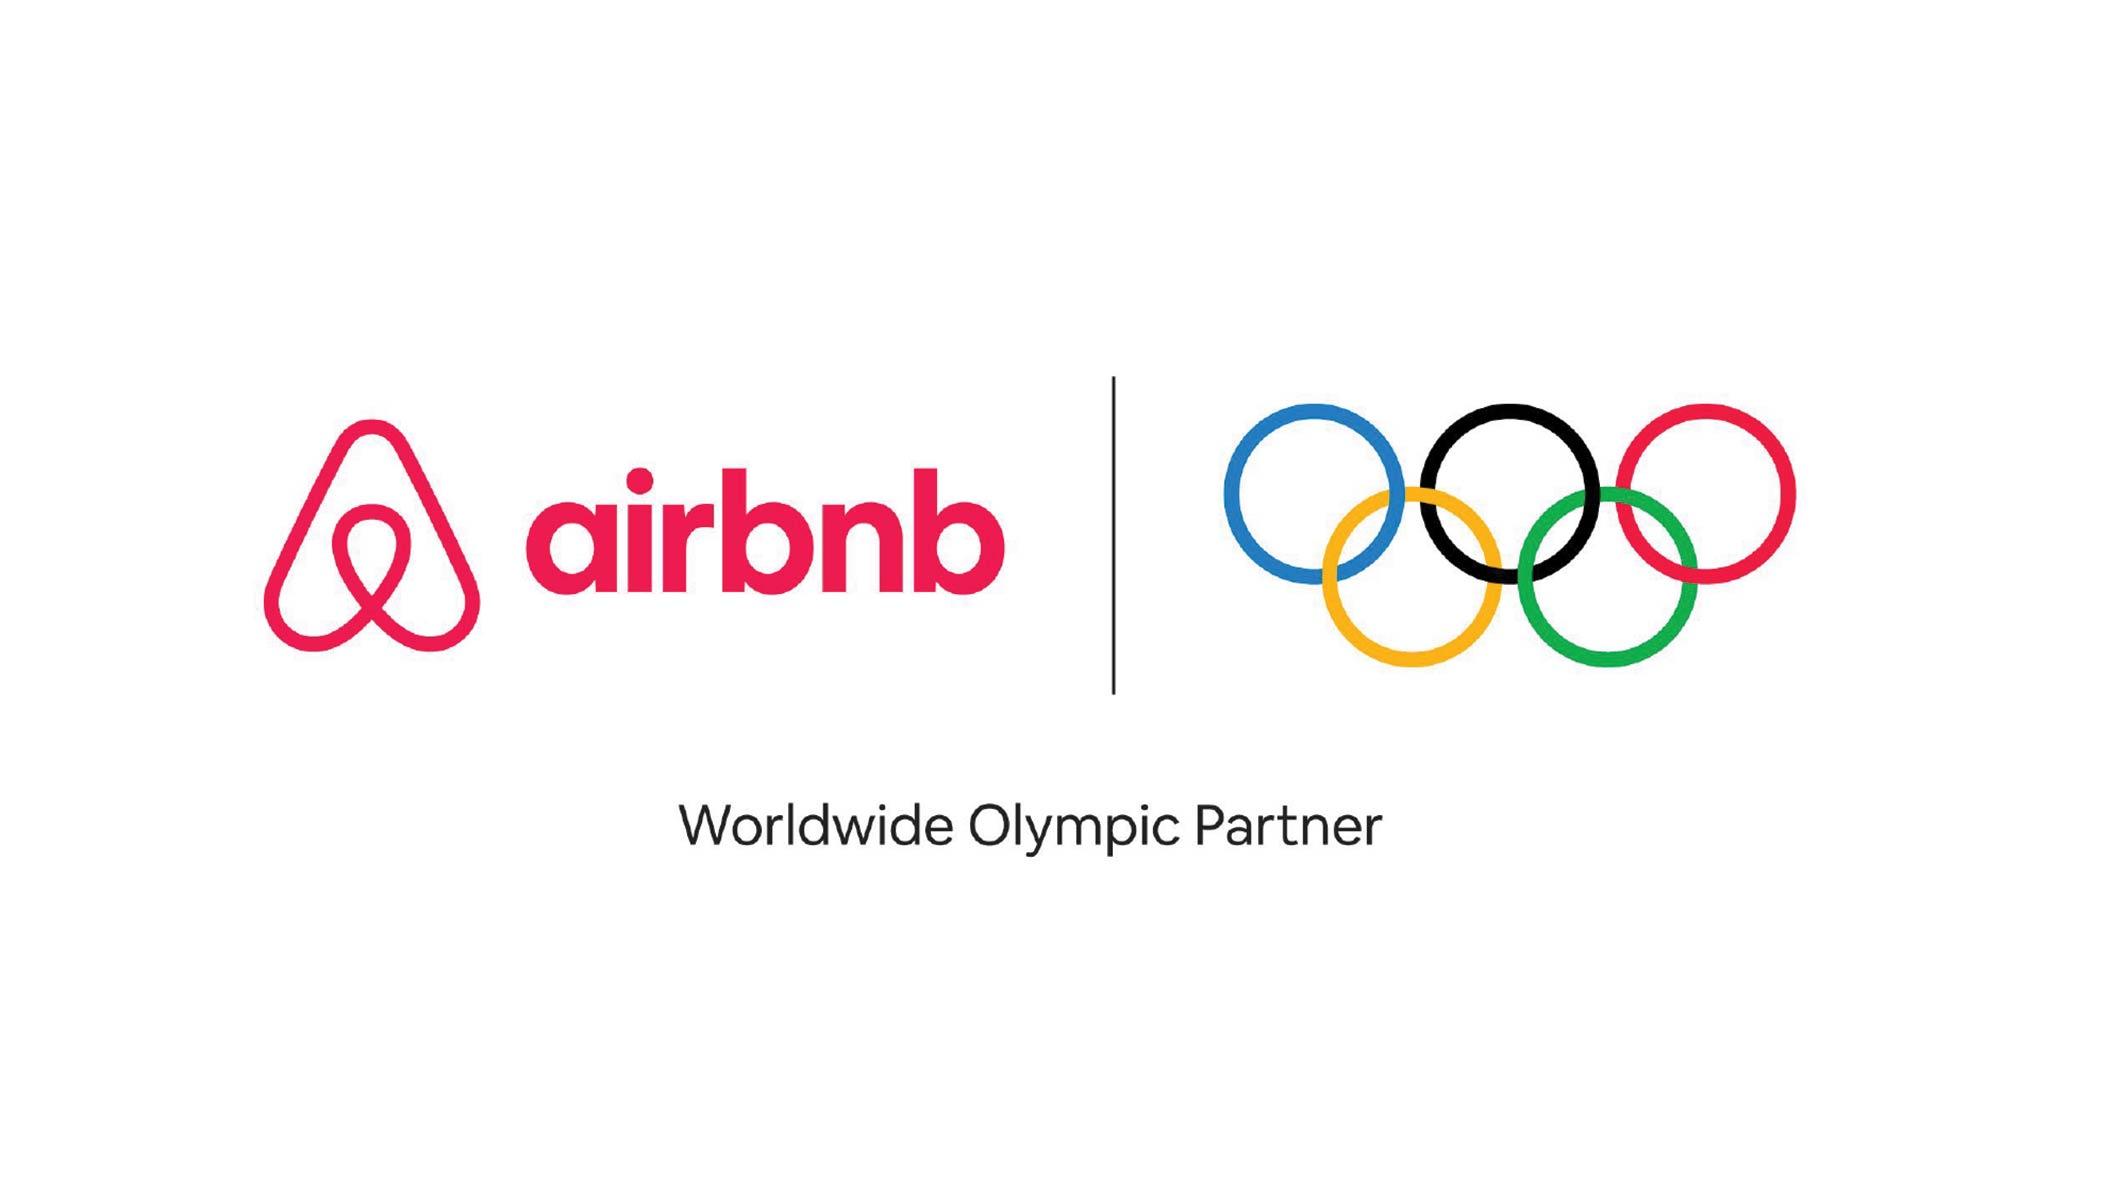 Olympic partner